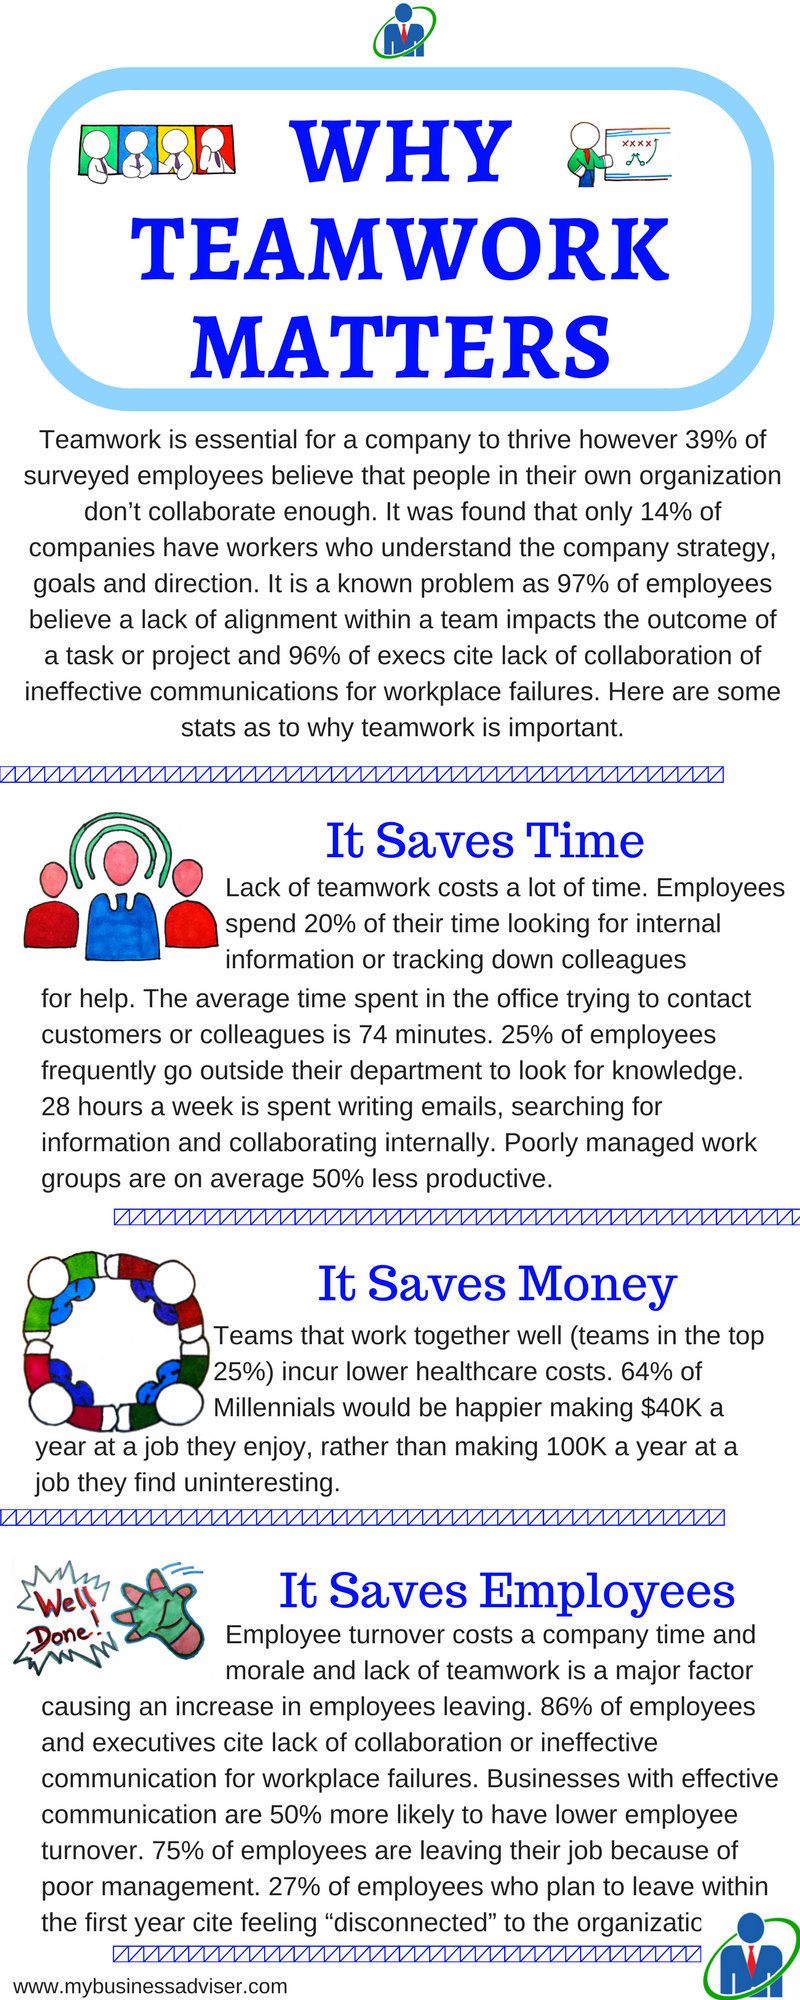 Why teamwork matters